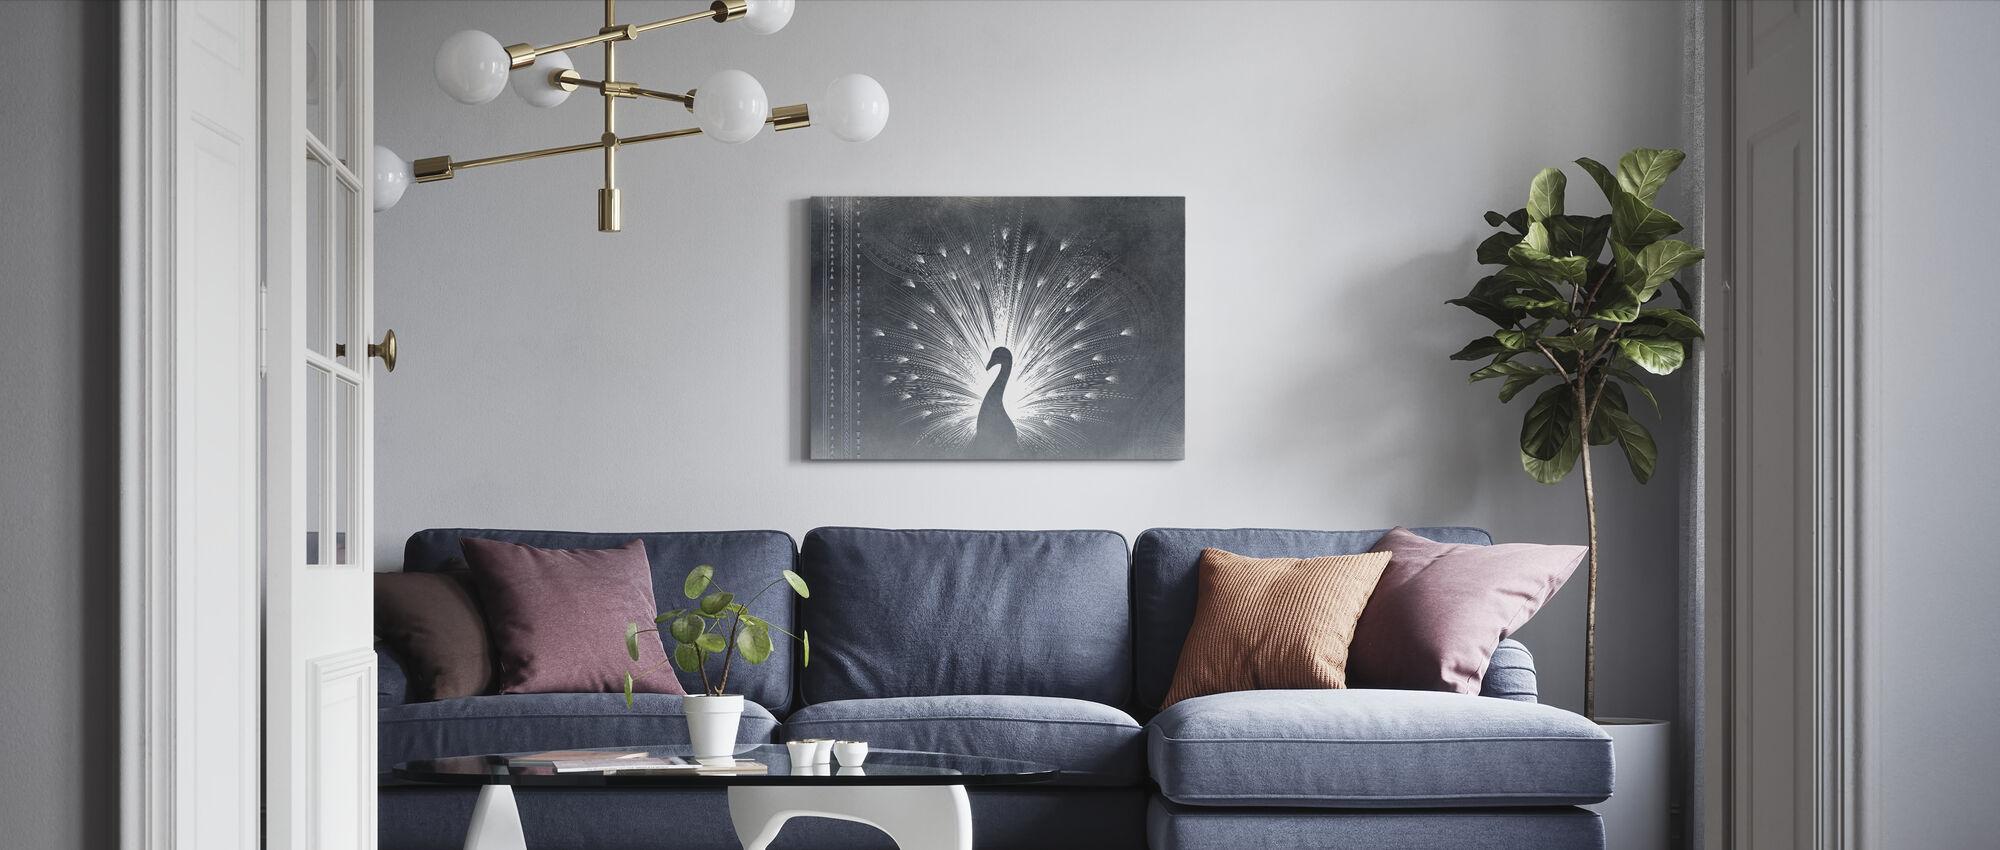 Peacock Deco - Canvas print - Living Room